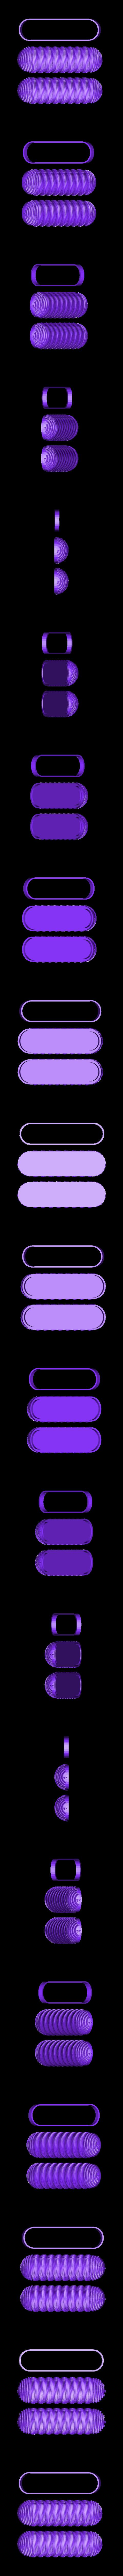 bacterium.stl Download free STL file chemistry and biology kit • 3D printing template, JOHLINK